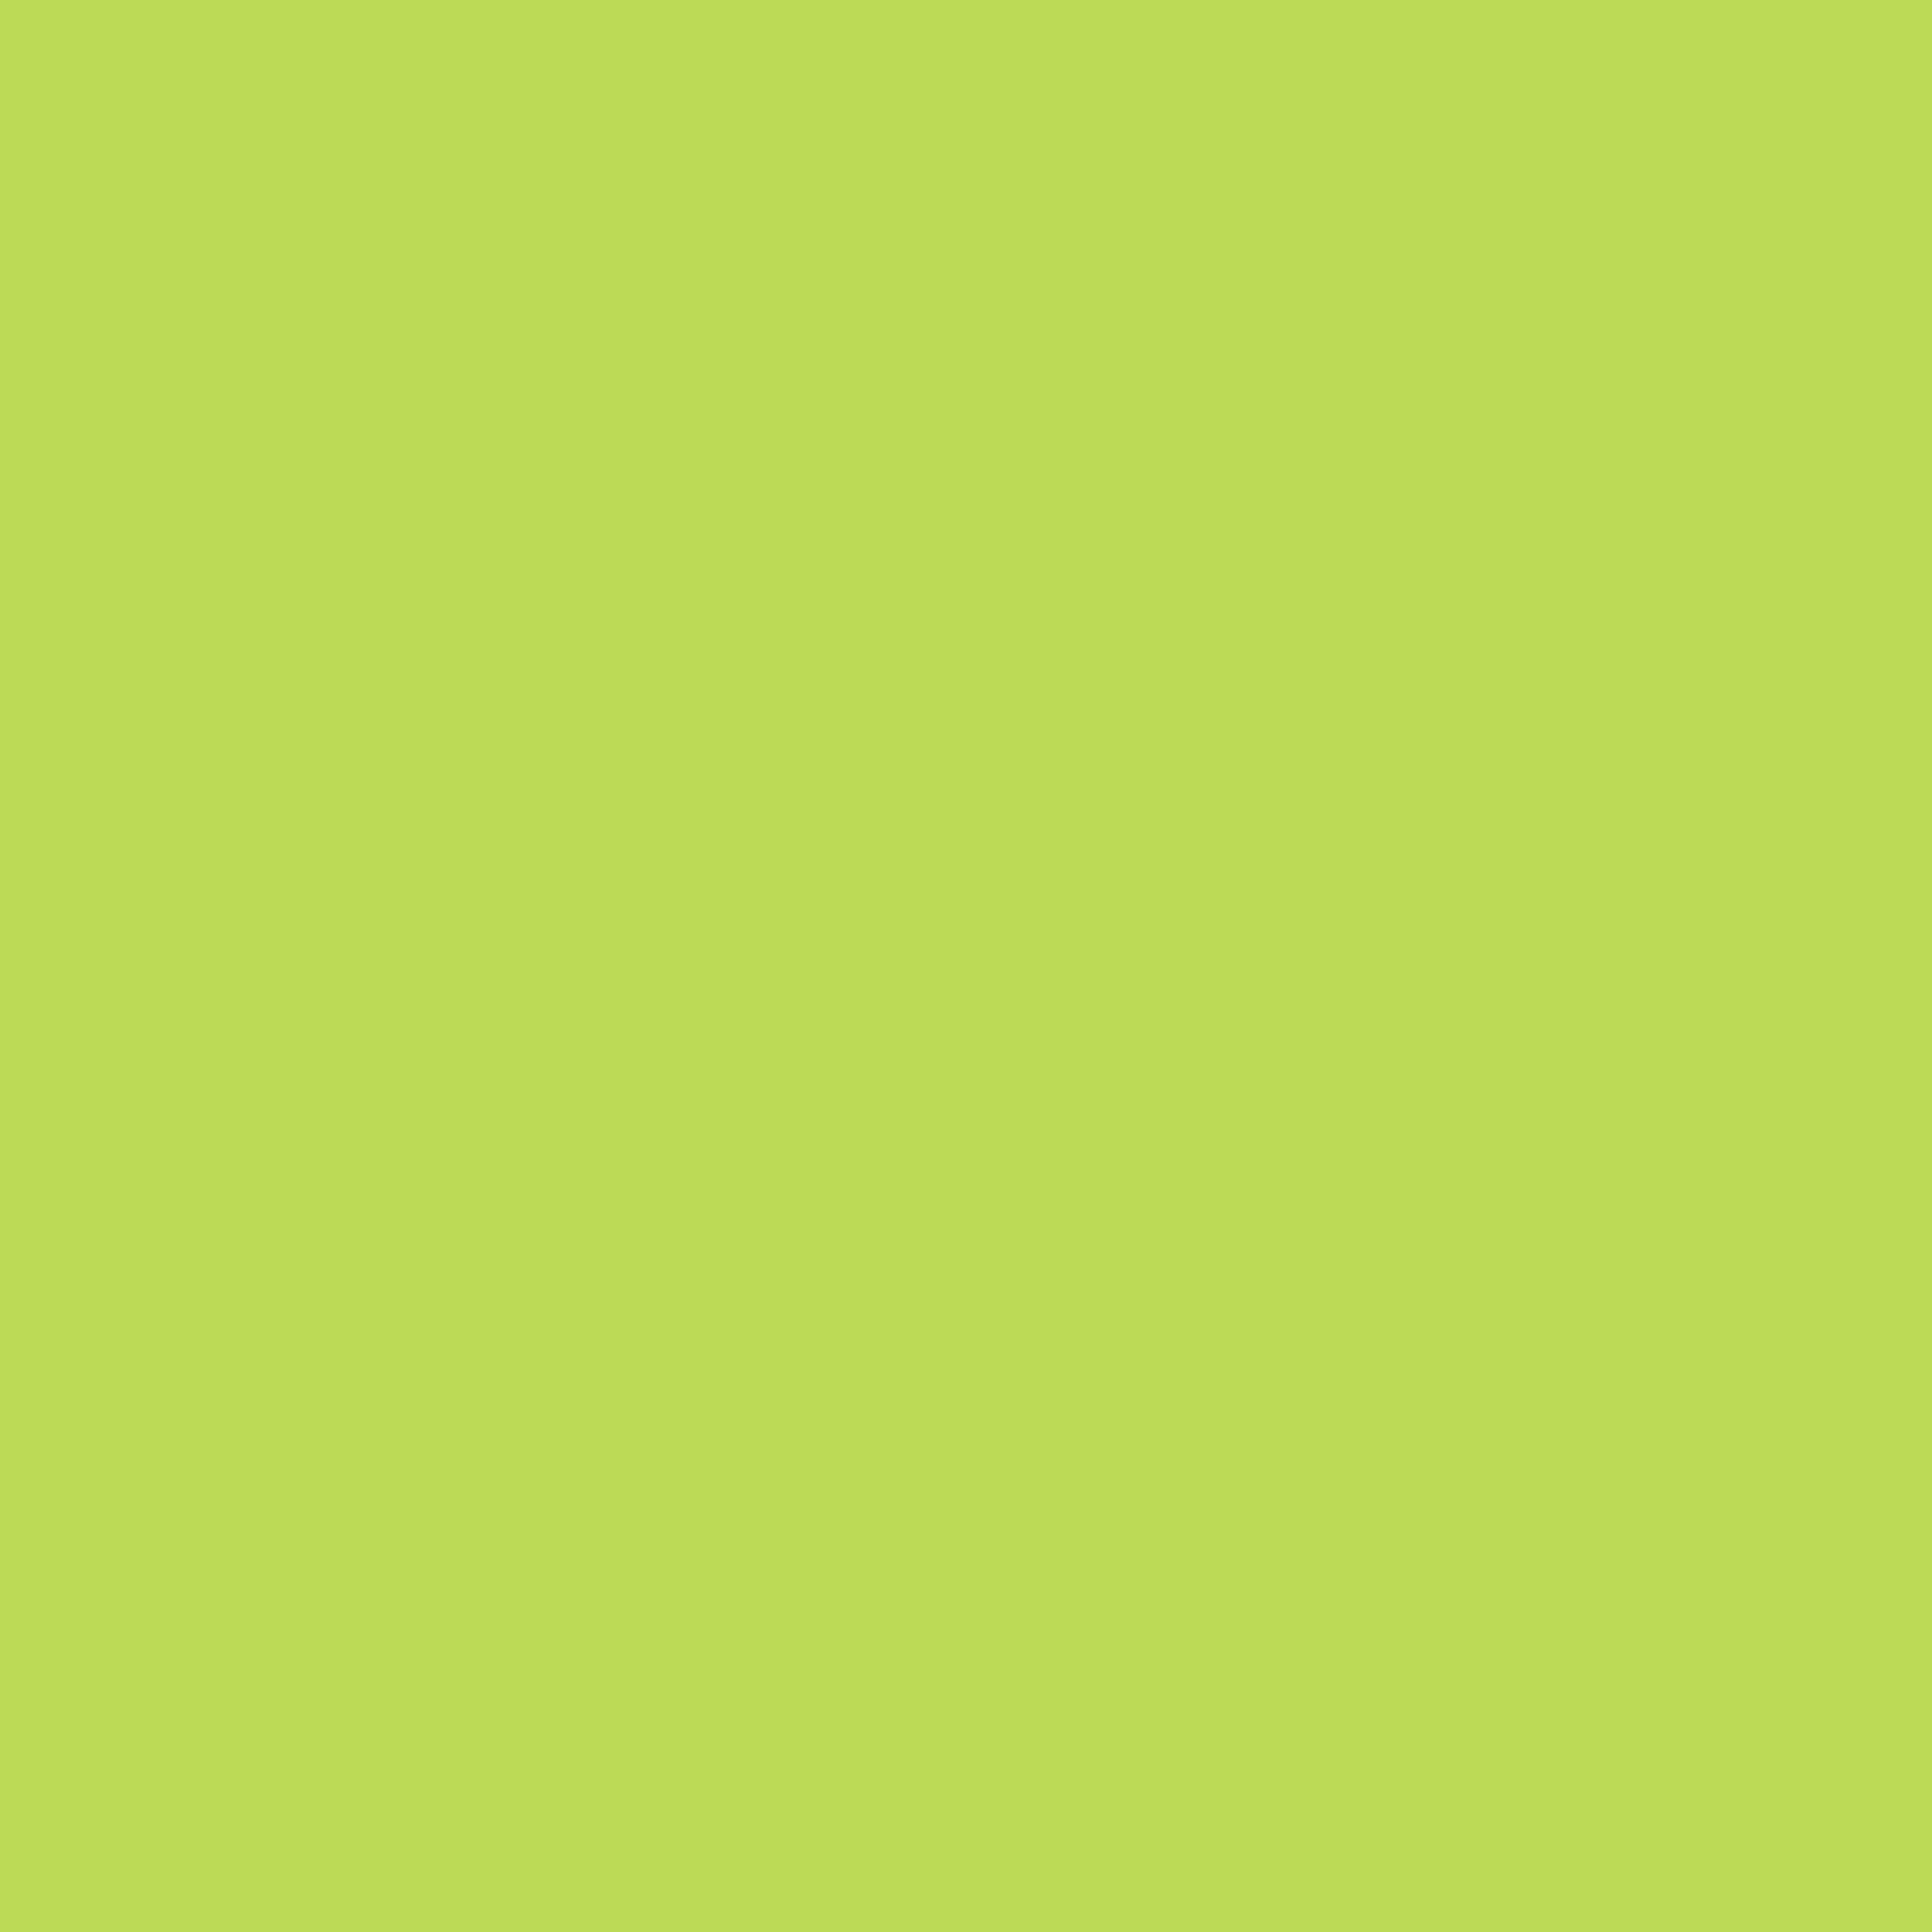 2048x2048 June Bud Solid Color Background